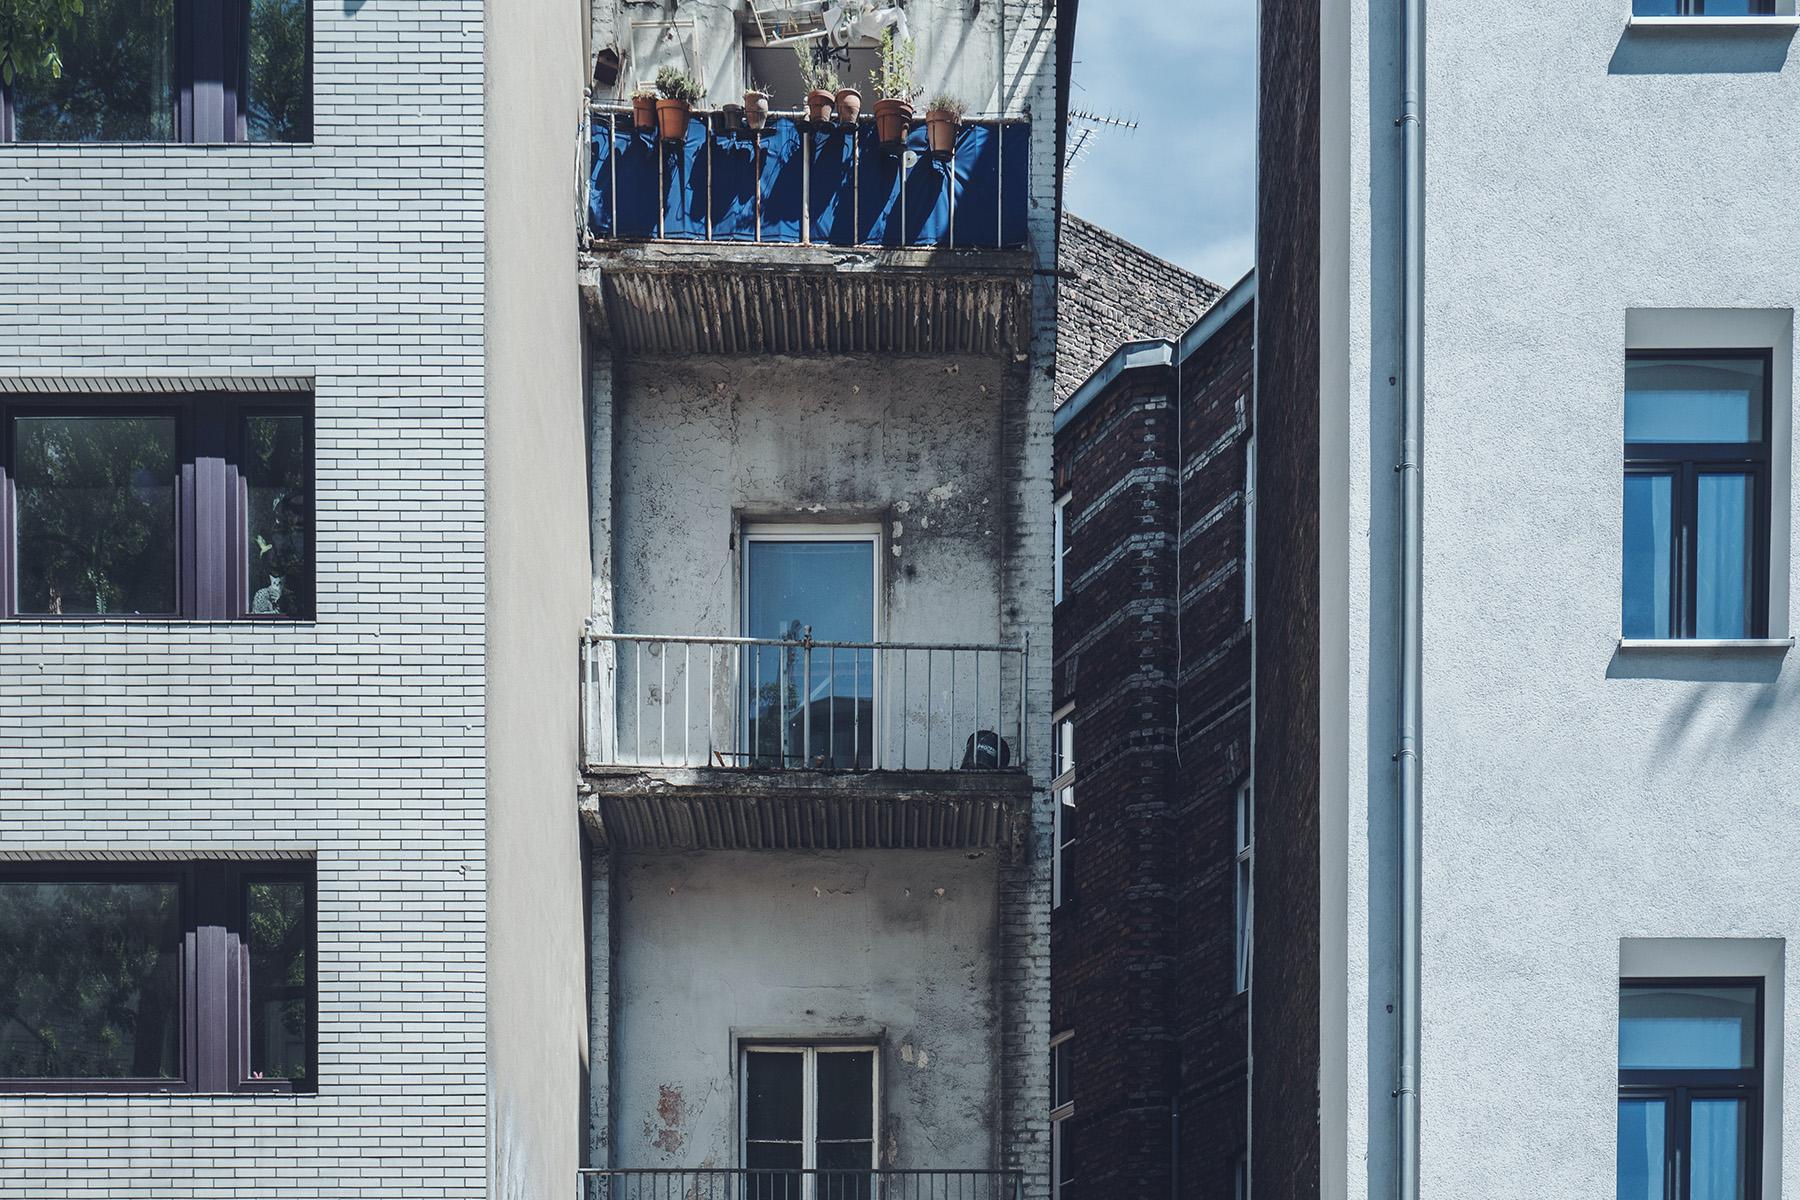 Wohnen, Mieten, Köln – ©Unsplash